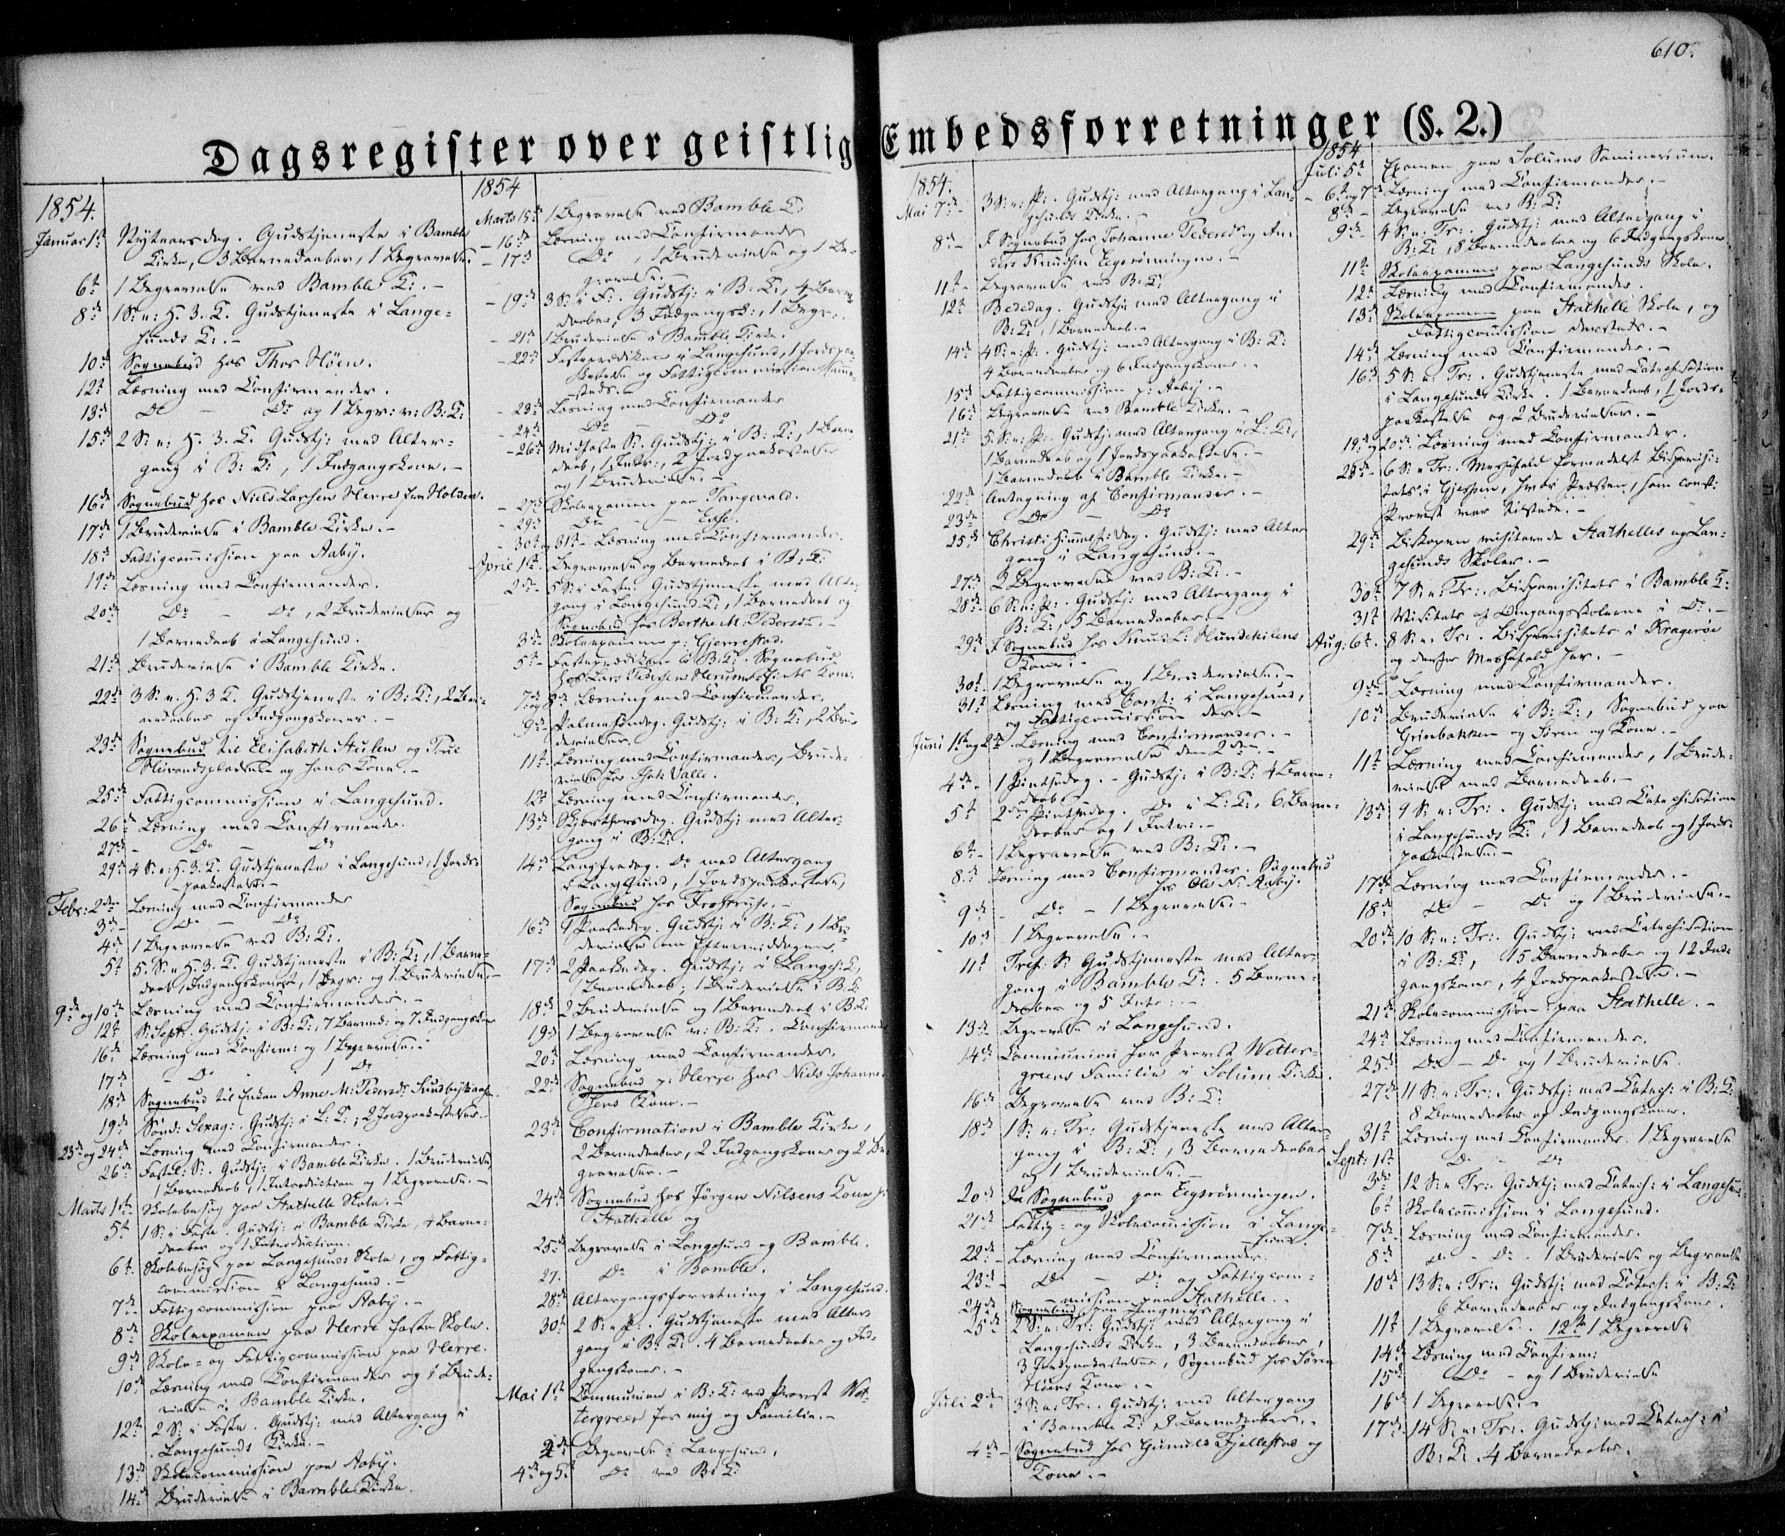 SAKO, Bamble kirkebøker, F/Fa/L0005: Ministerialbok nr. I 5, 1854-1869, s. 610